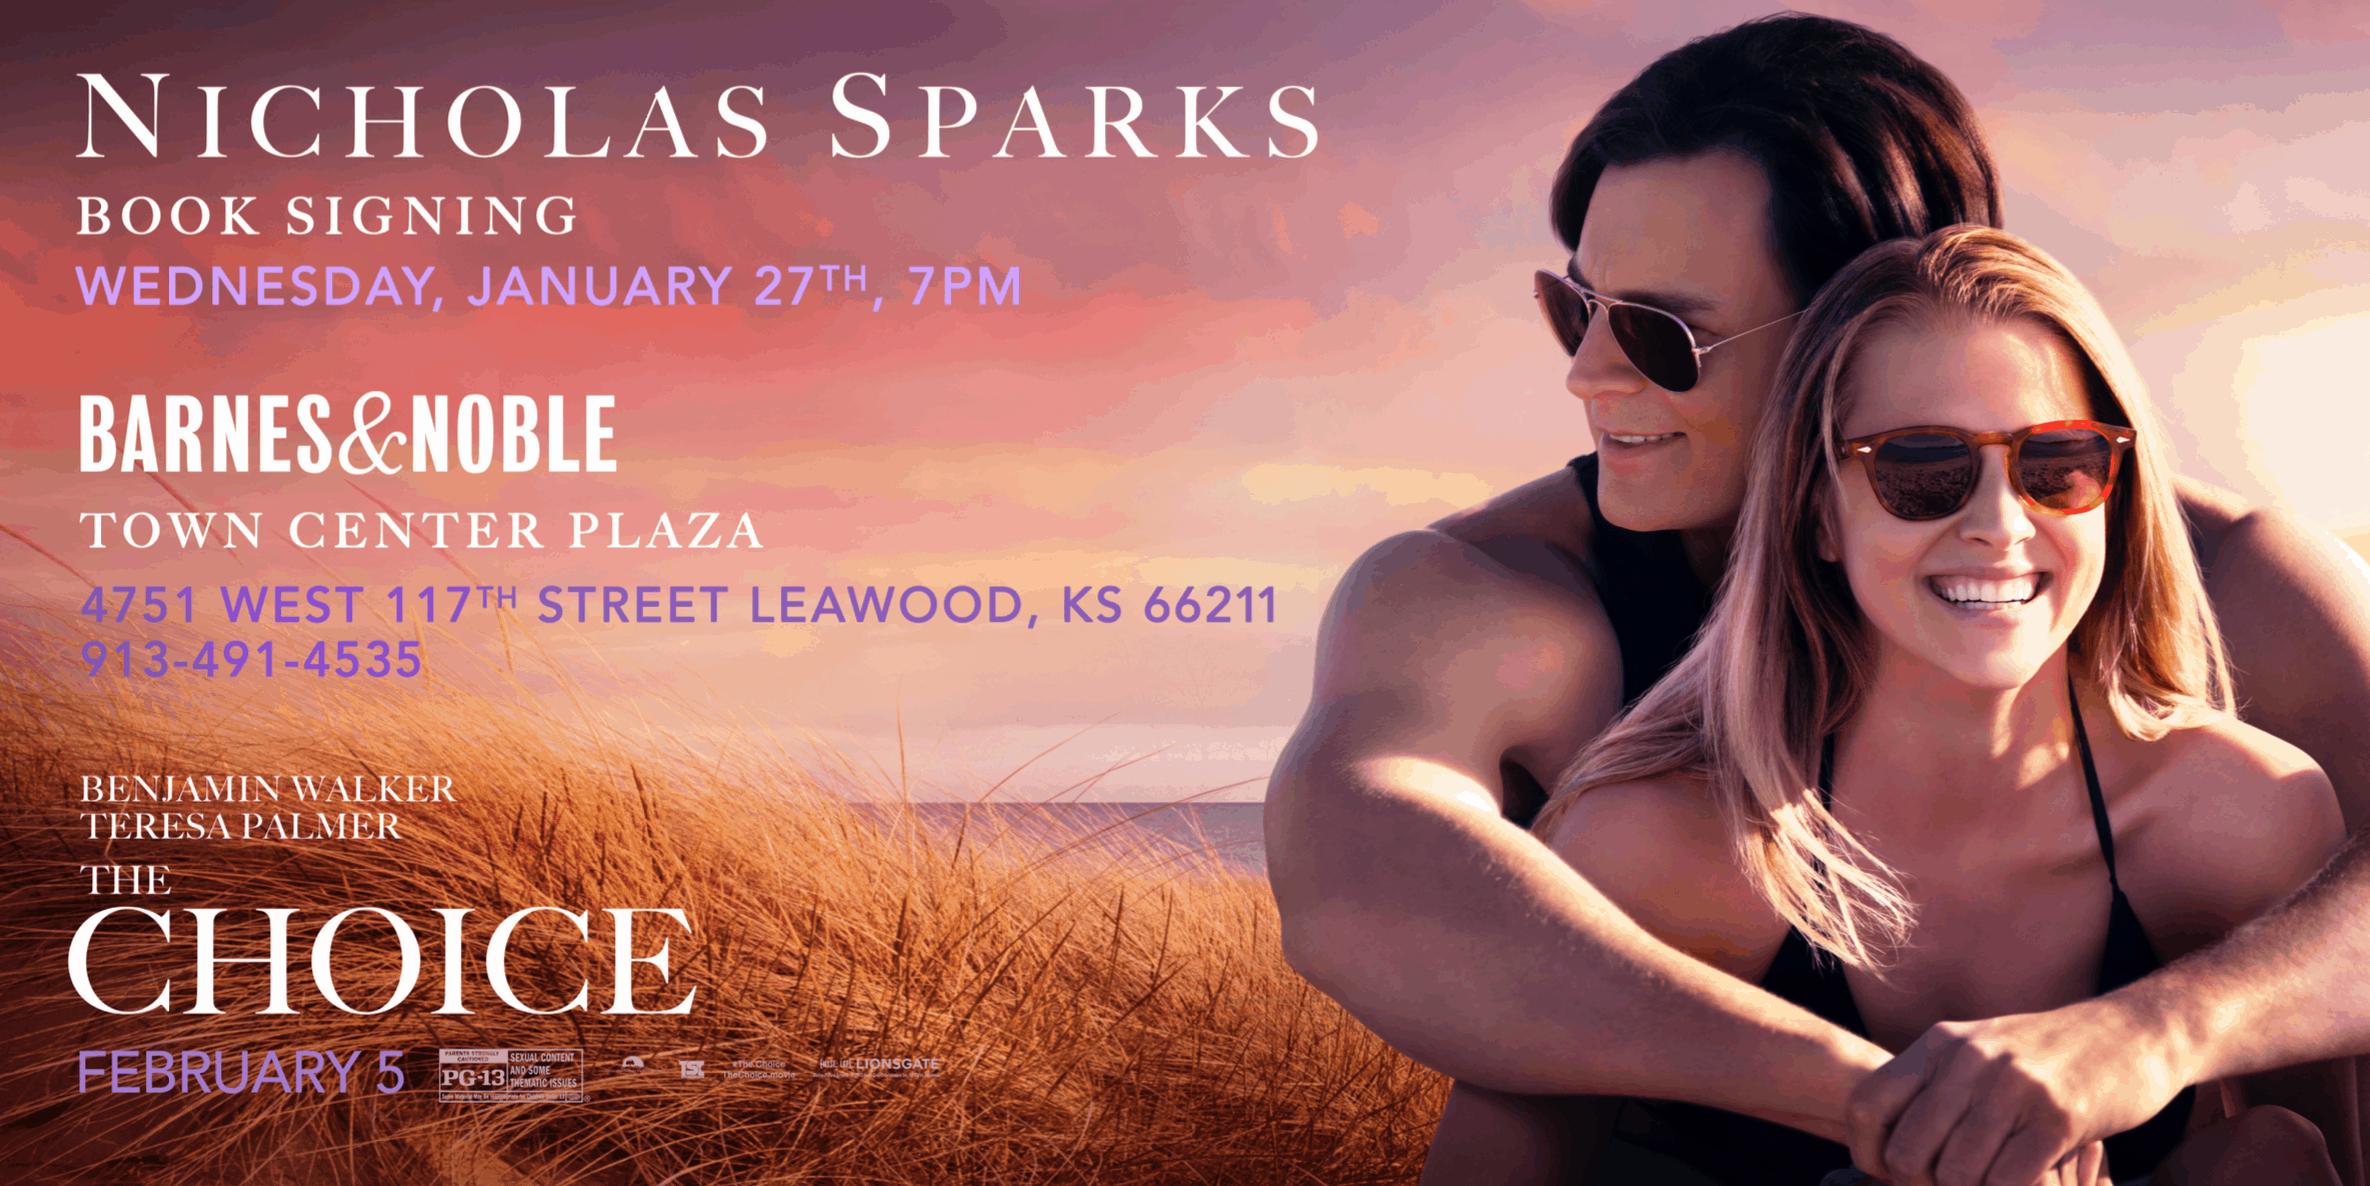 Nicholas Sparks Kansas City Book Signing – The Choice